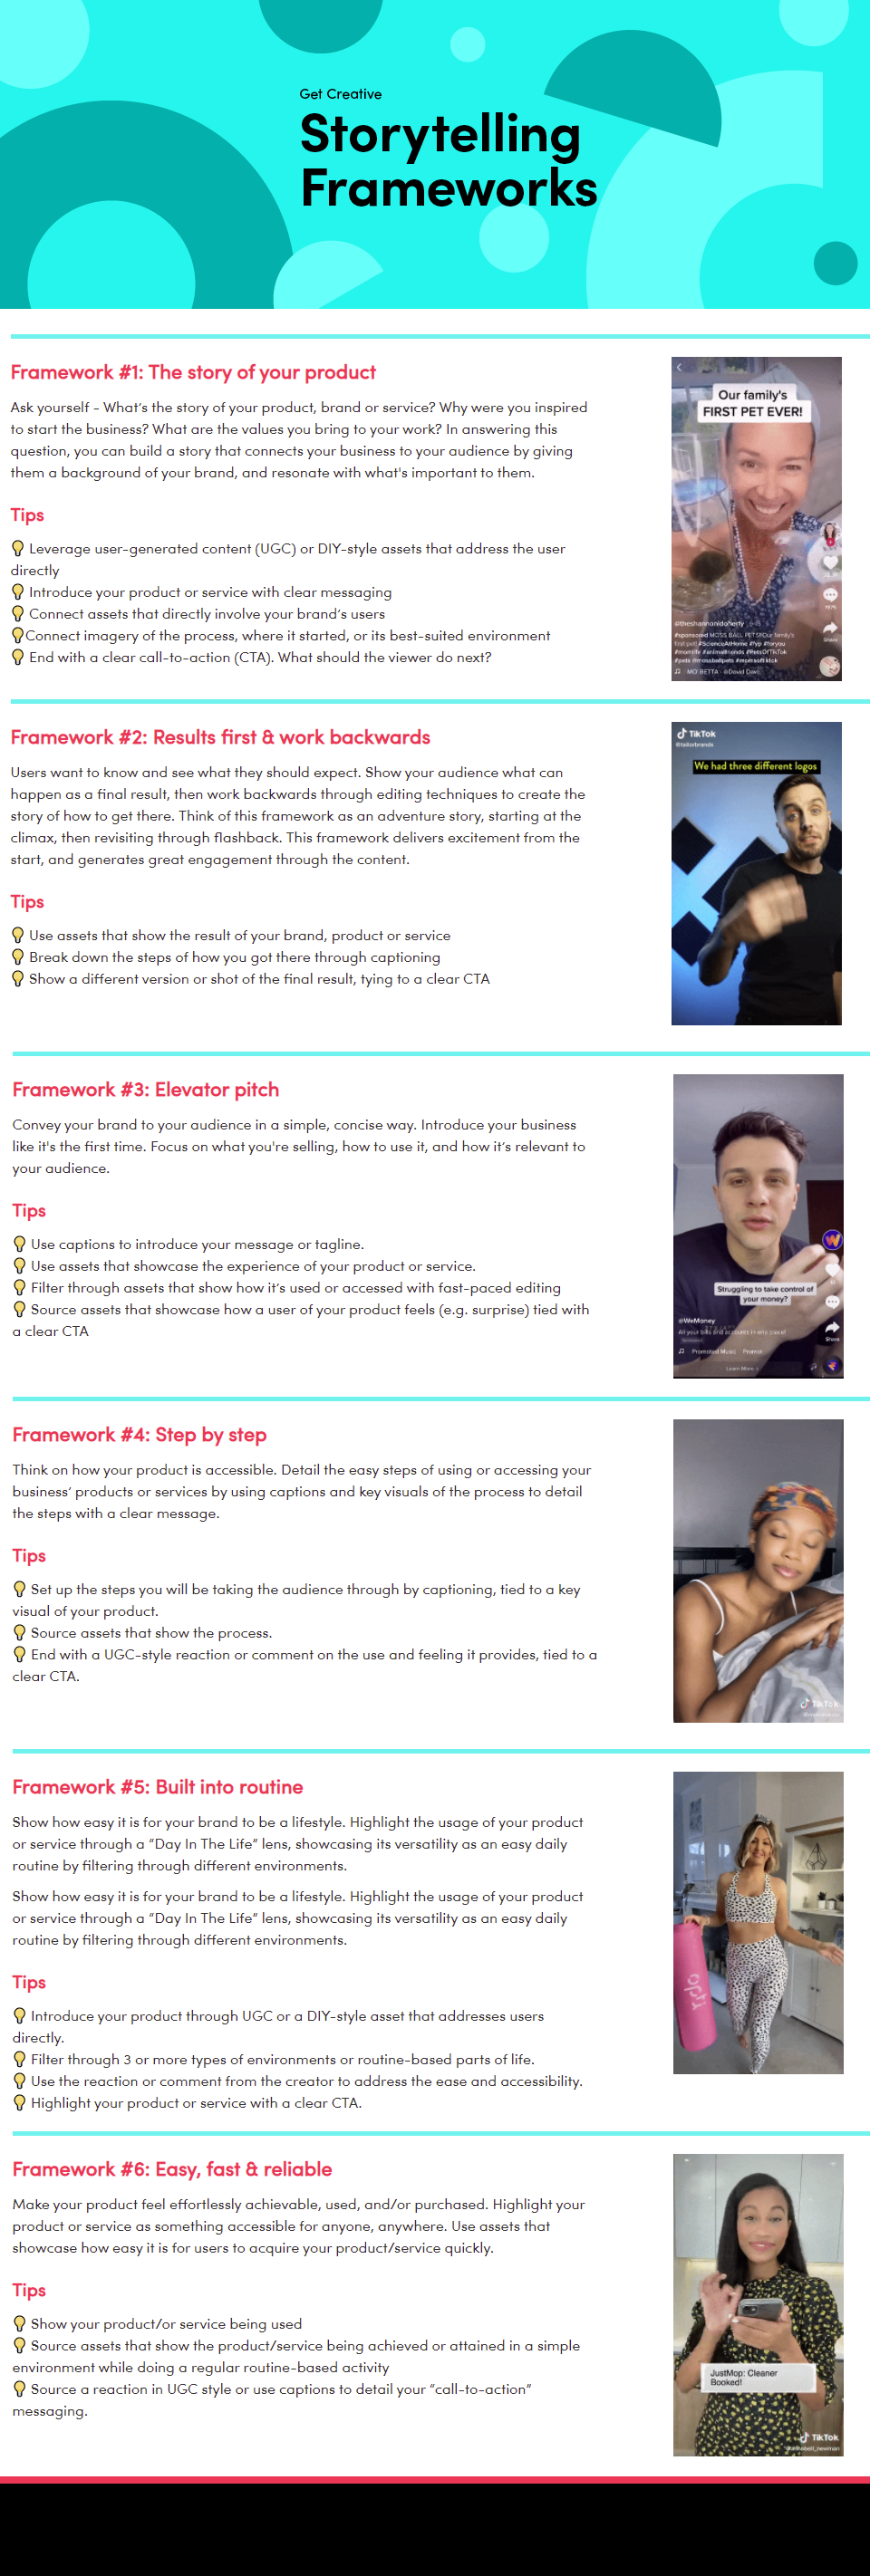 TikTok Ad Creative tips